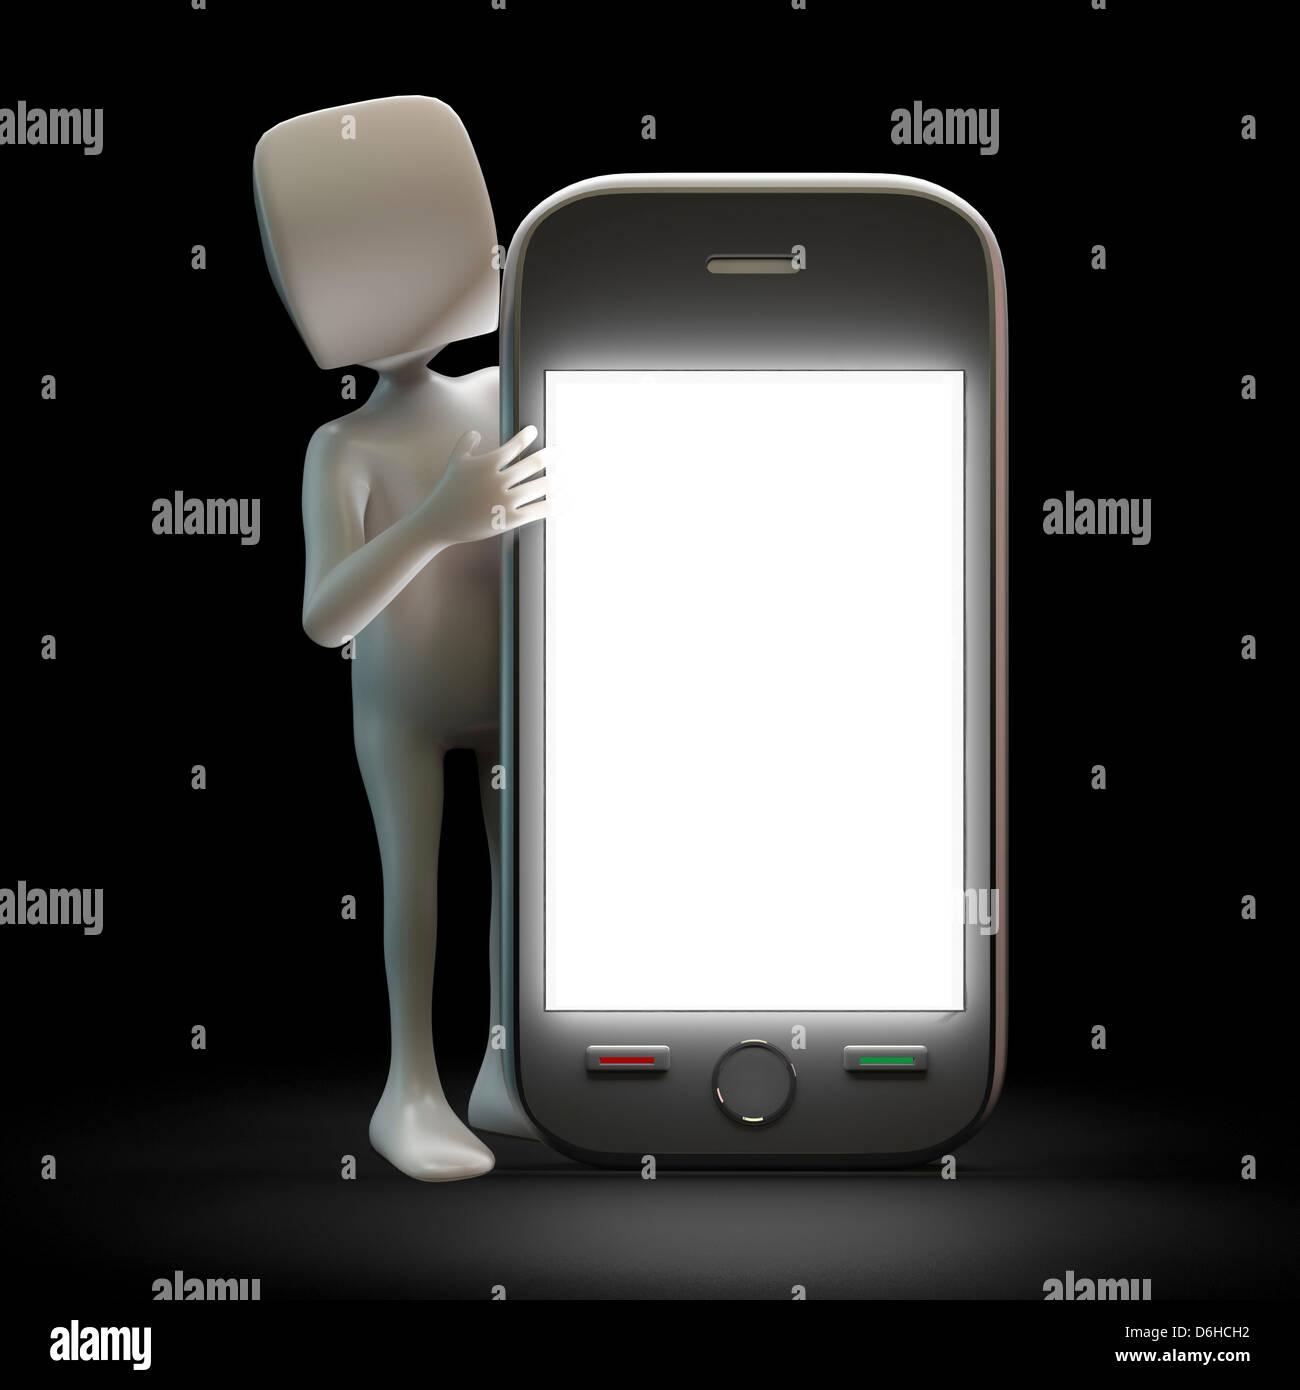 Smartphone, artwork - Stock Image